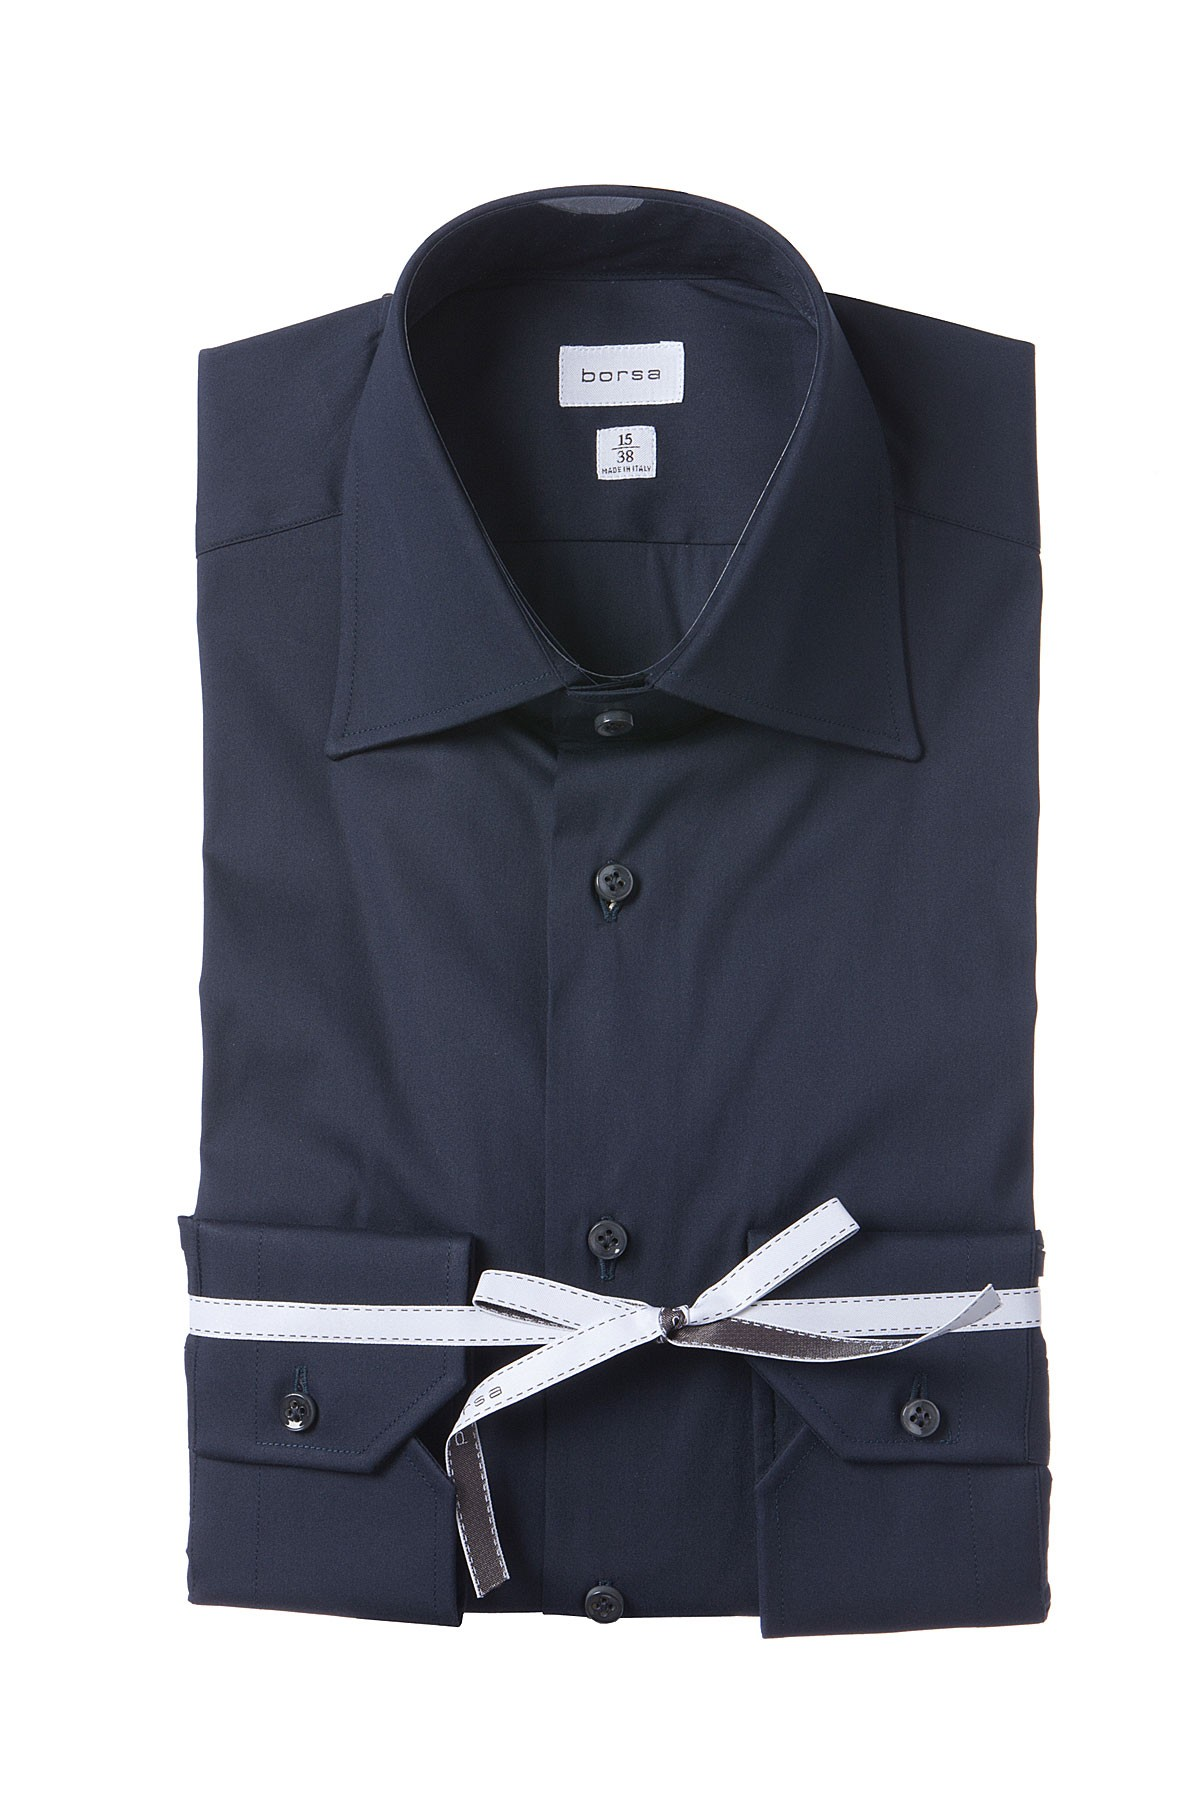 8176b87ea4c BORSA Dark blue shirt for man spring summer